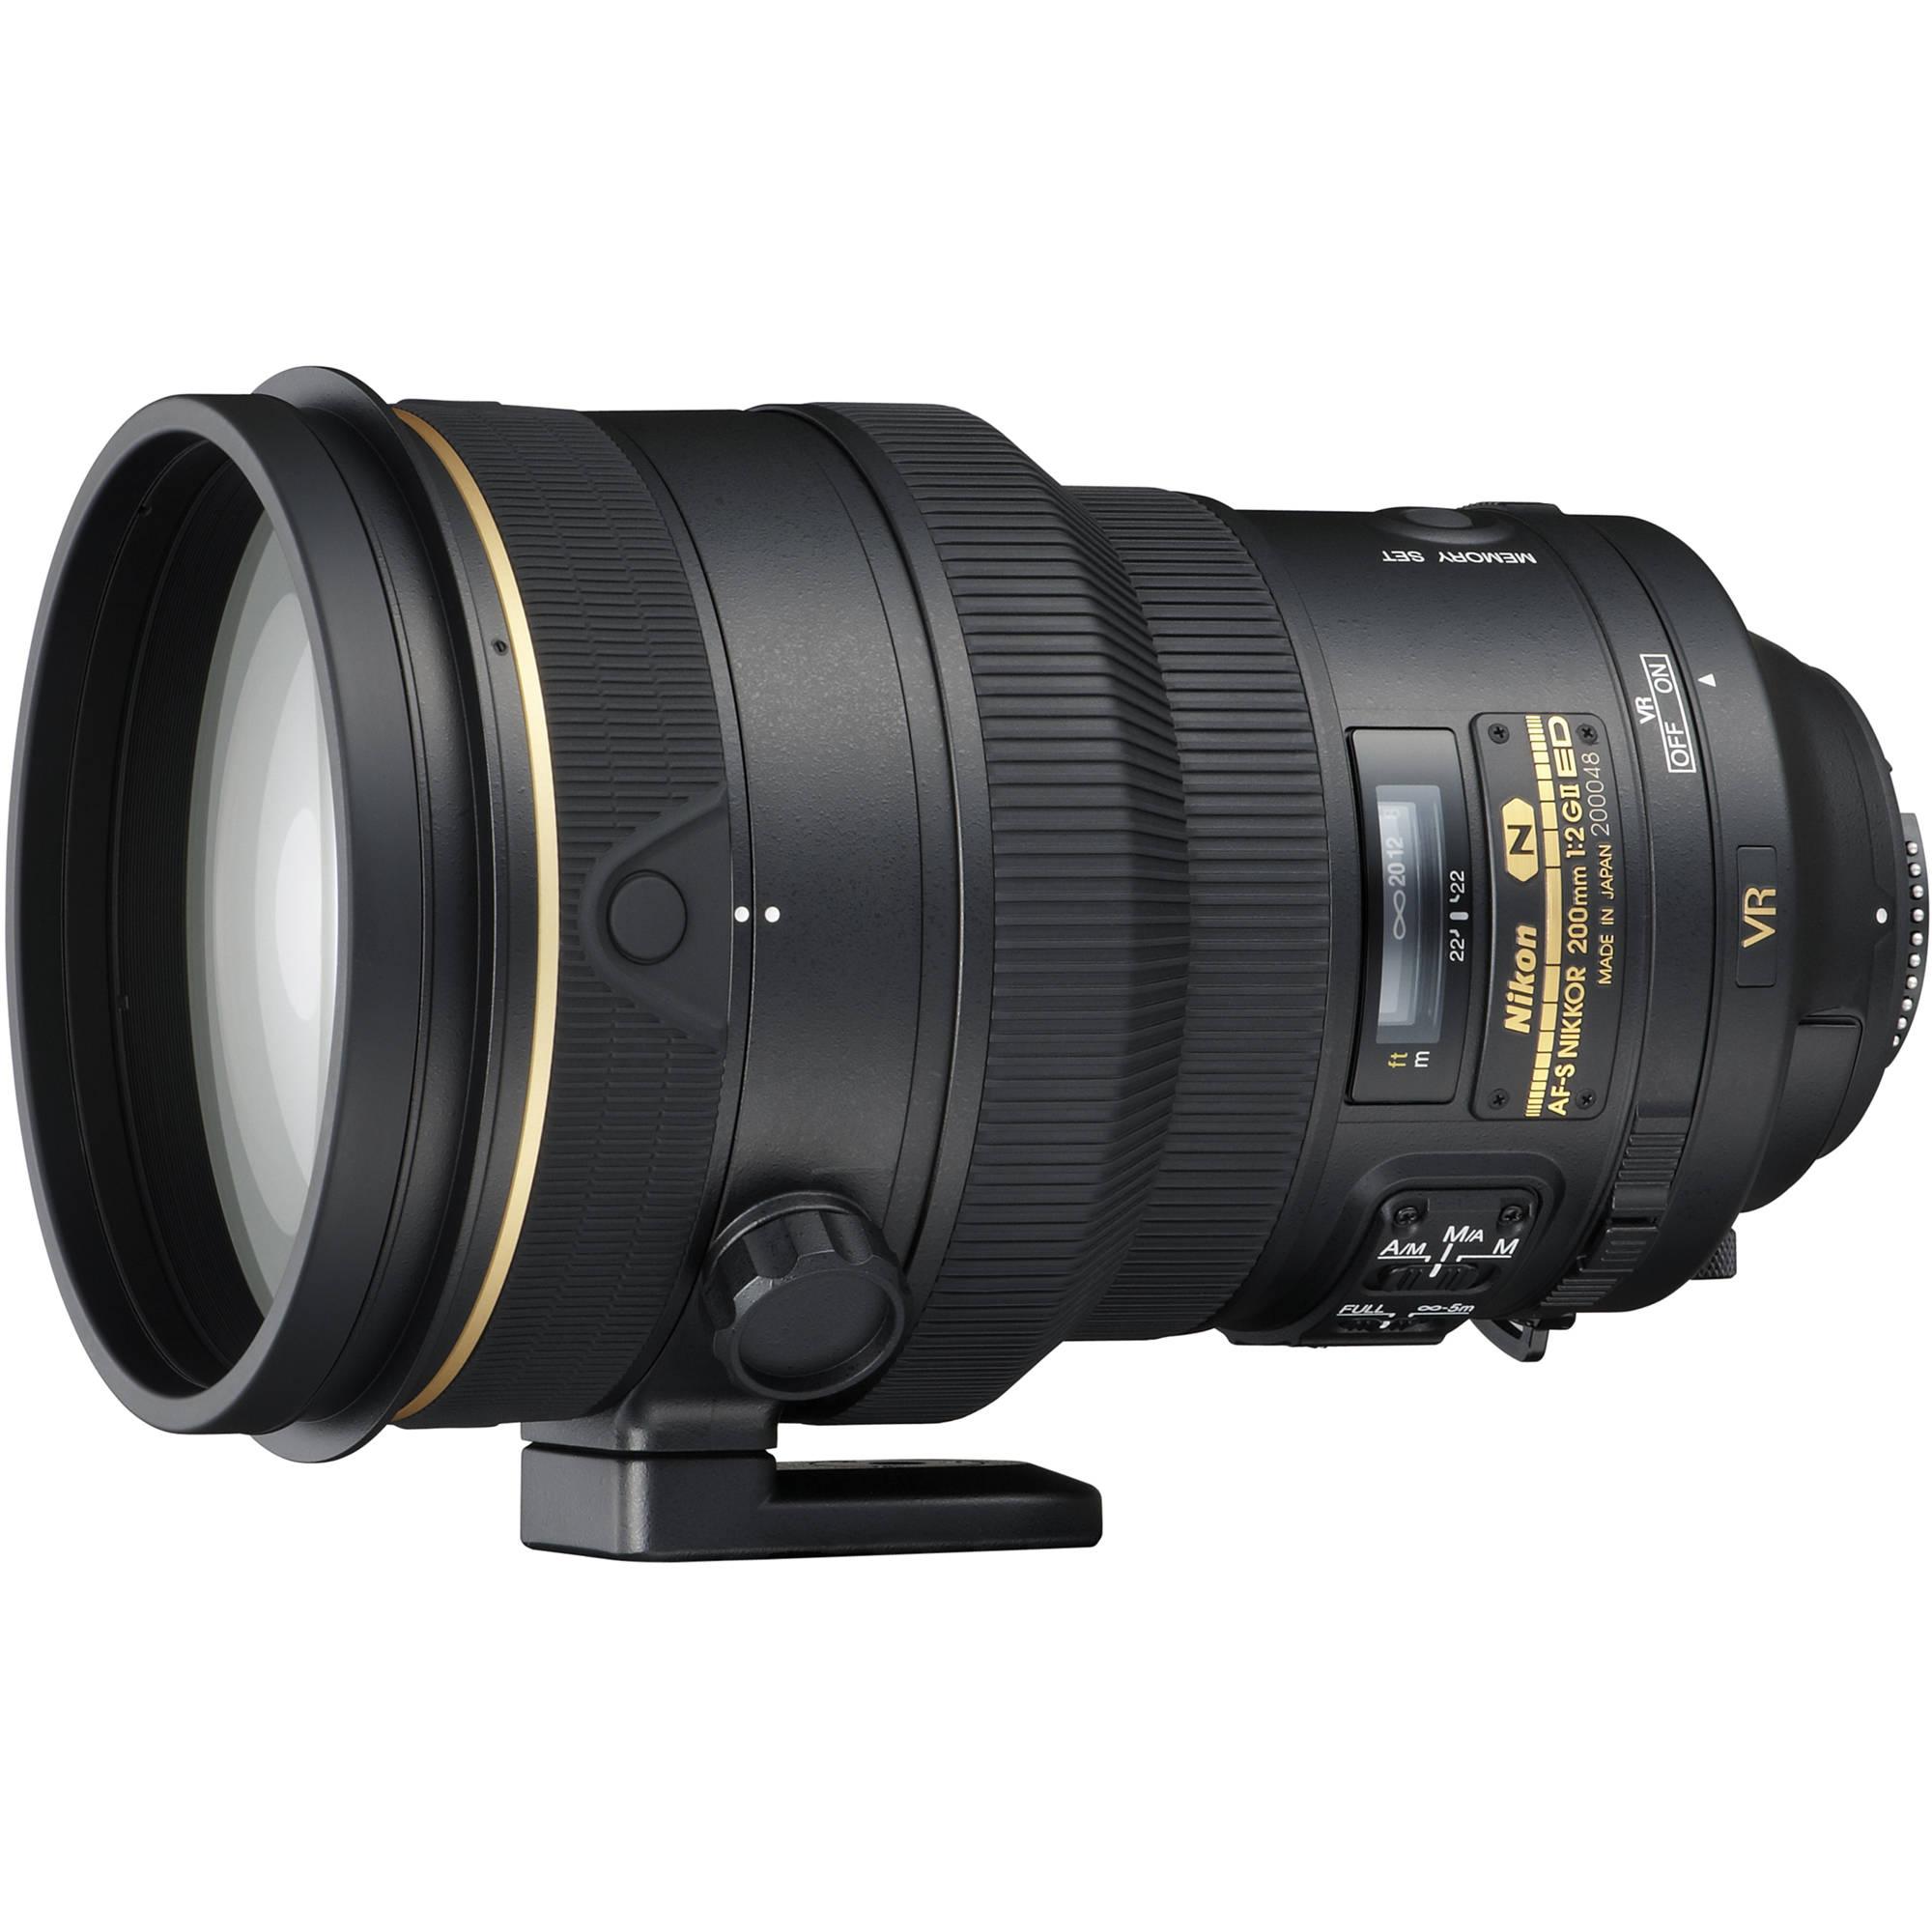 Nikon Af S Nikkor 200mm F 2g Ed Vr Ii Lens 2188 B Amp H Photo